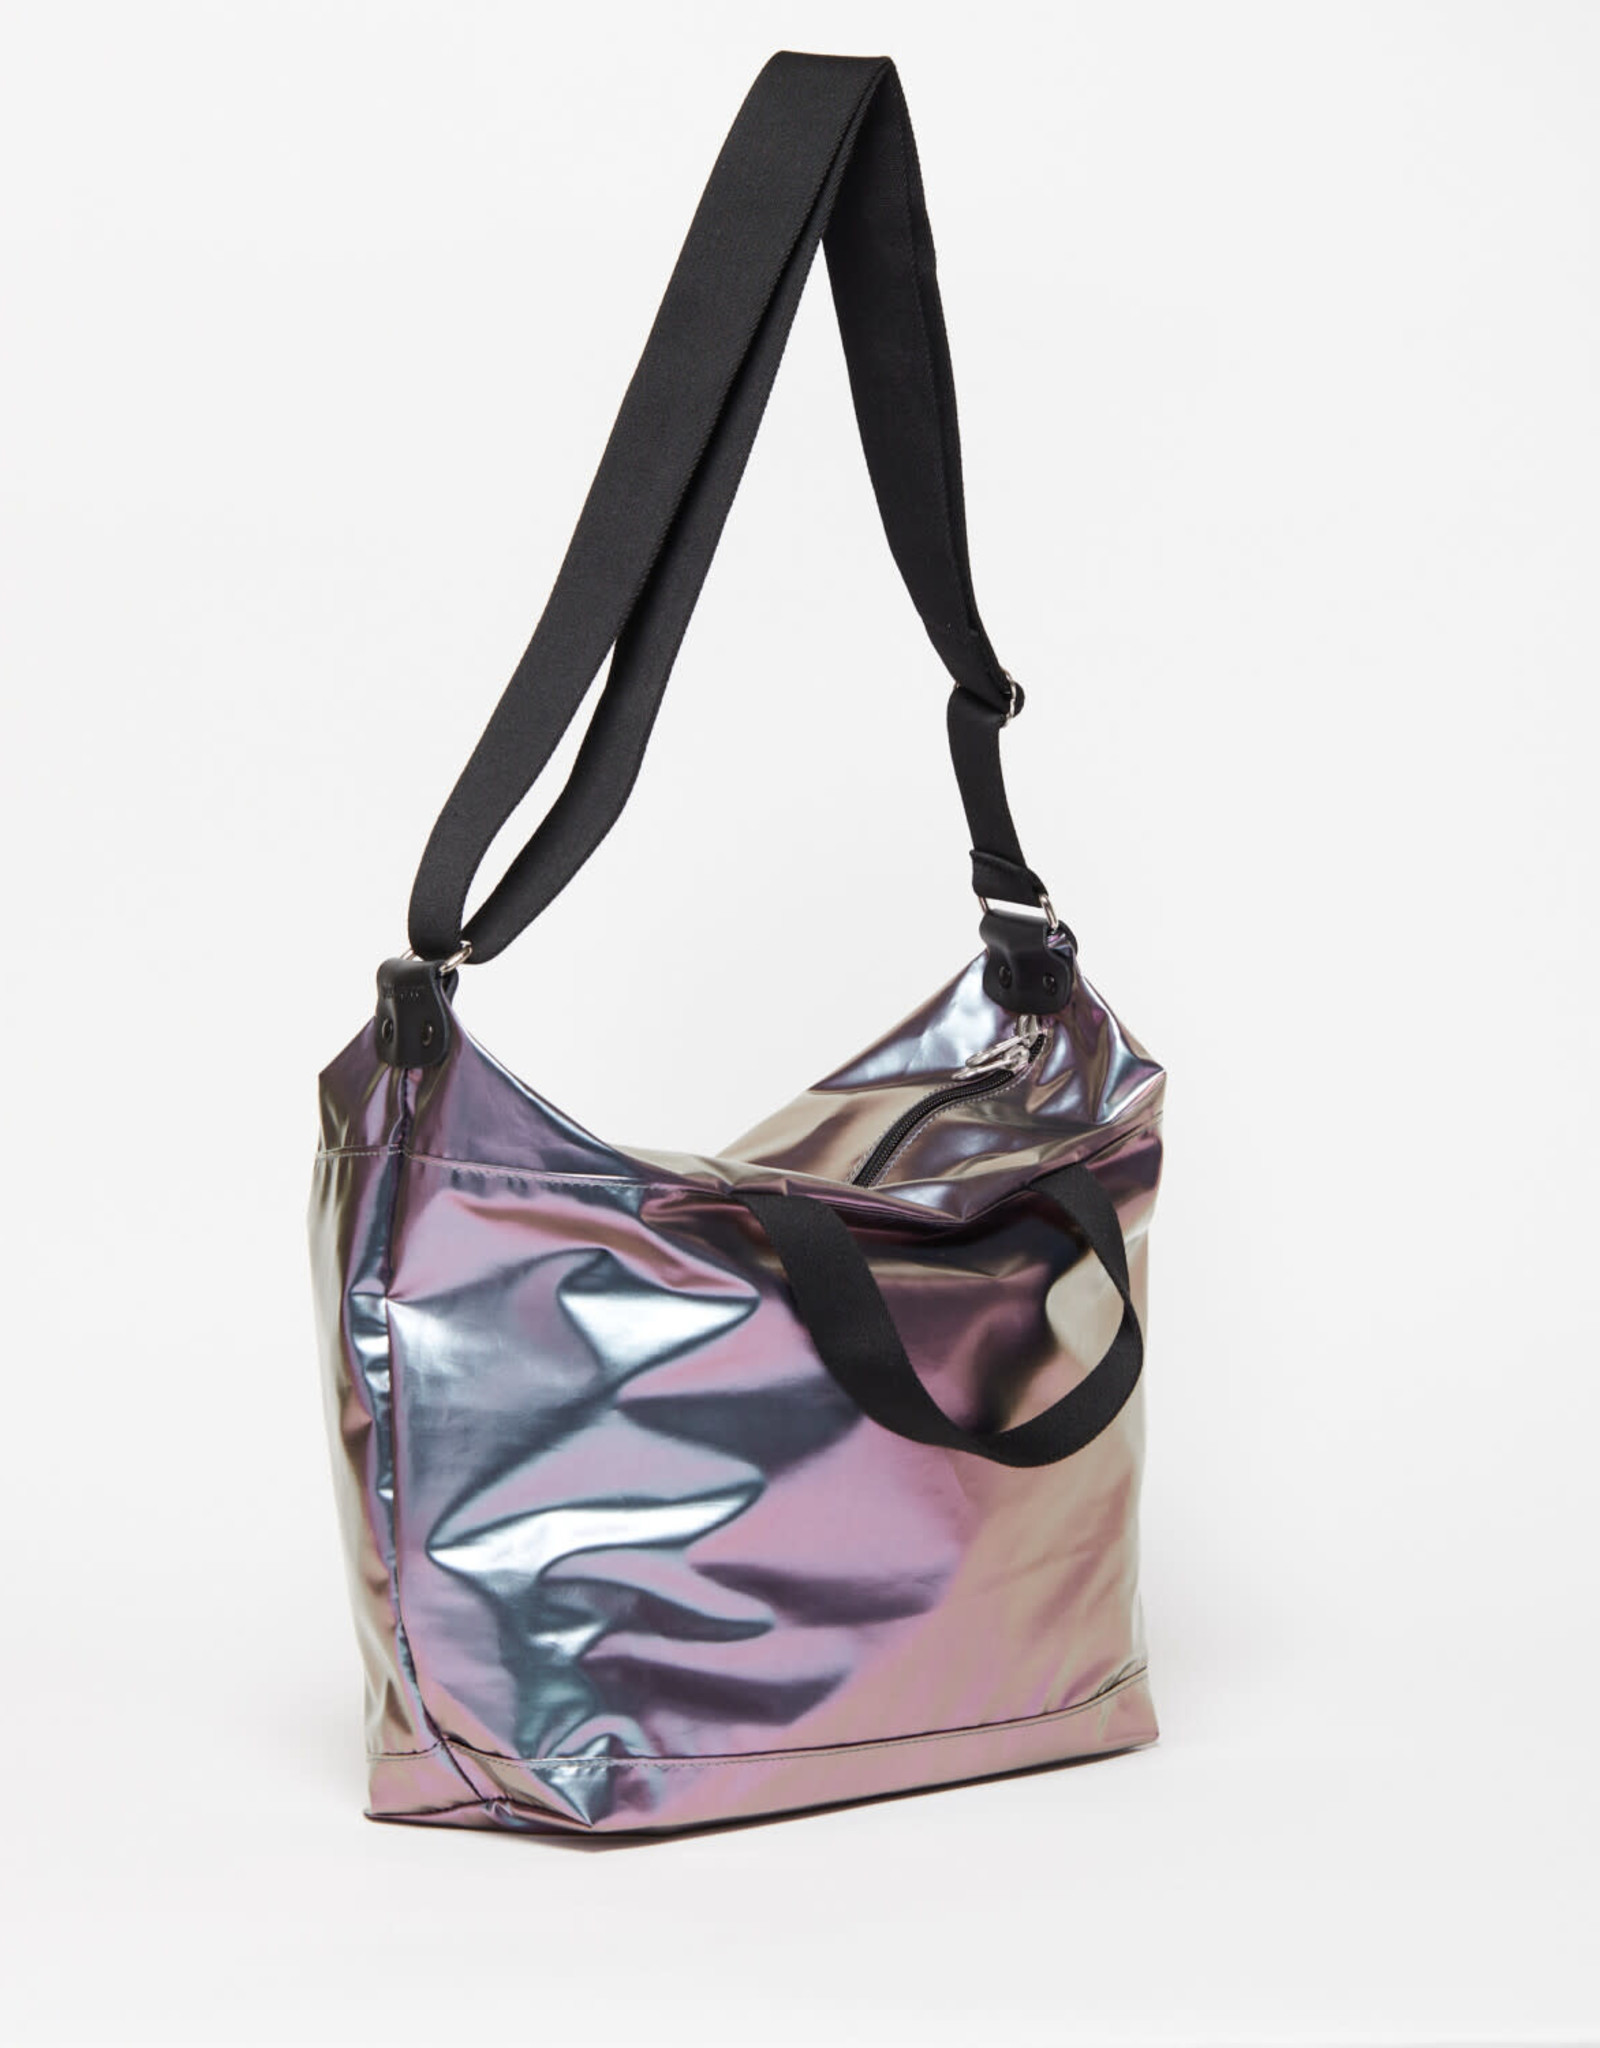 JACK GOMME Orta Adjustable Bag